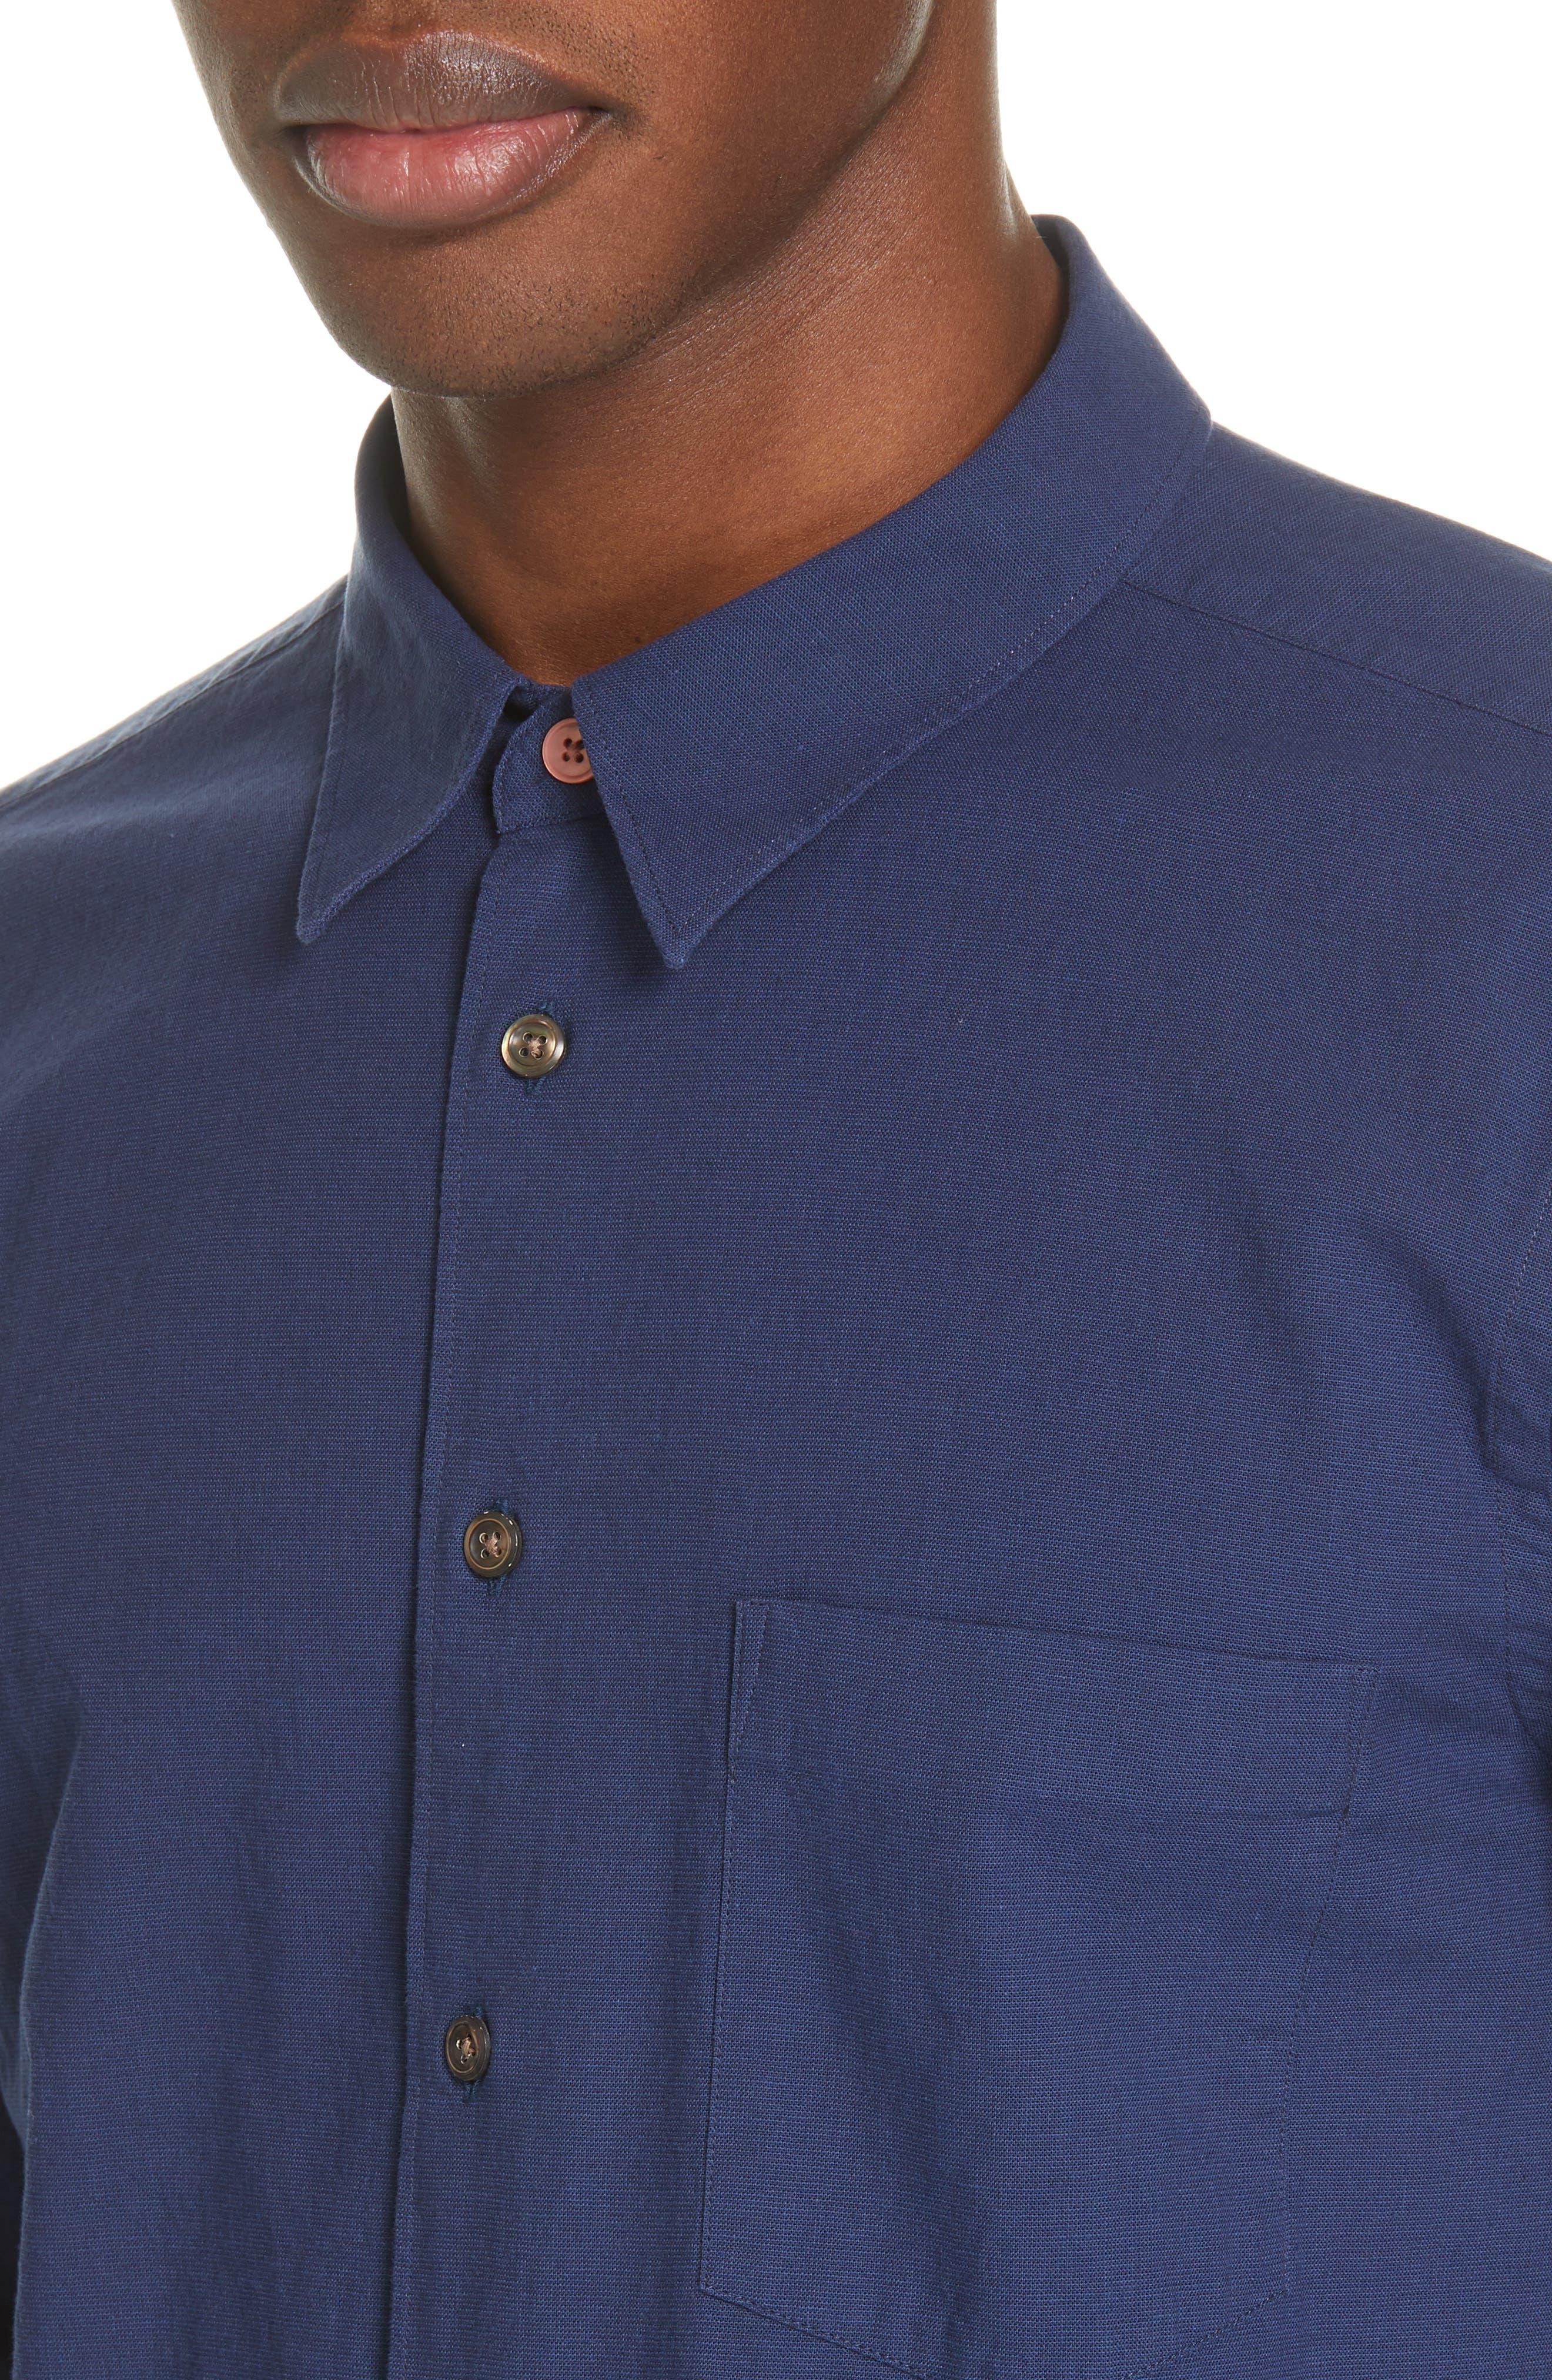 PS PAUL SMITH, Contrast Sport Shirt, Alternate thumbnail 2, color, BLUE